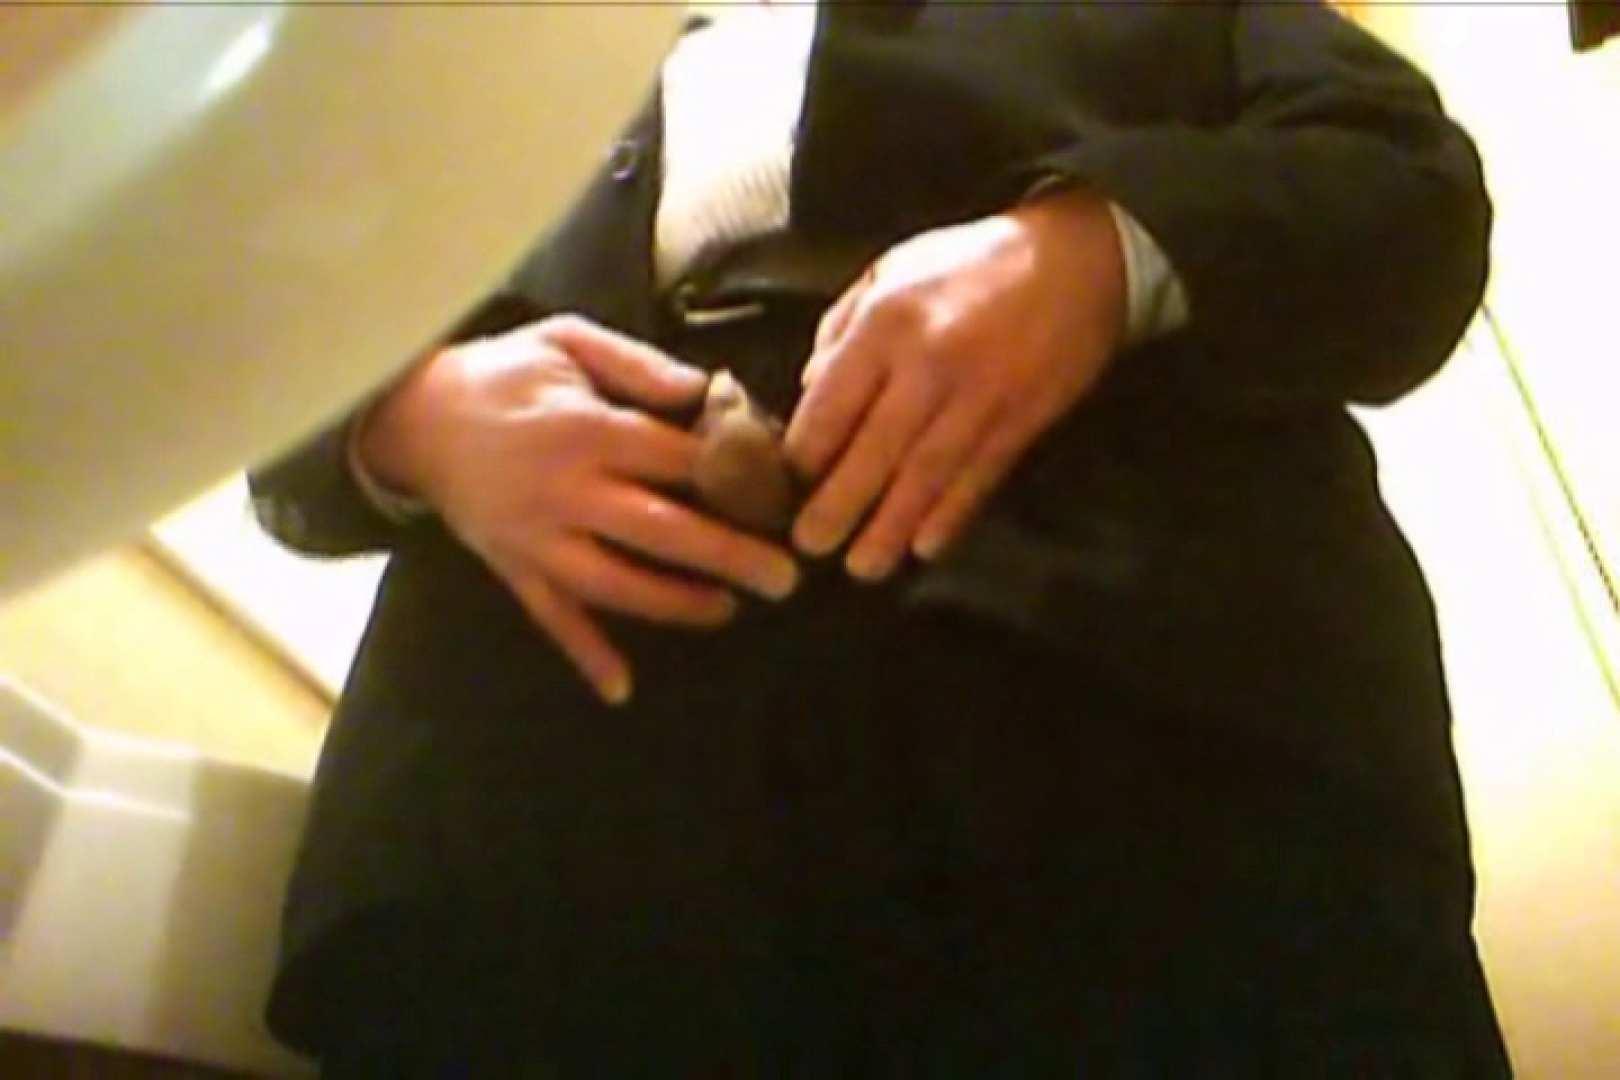 SEASON 2ND!掴み取りさんの洗面所覗き!in新幹線!VOL.21 スジ筋系マッチョマン ゲイえろ動画紹介 93連発 5